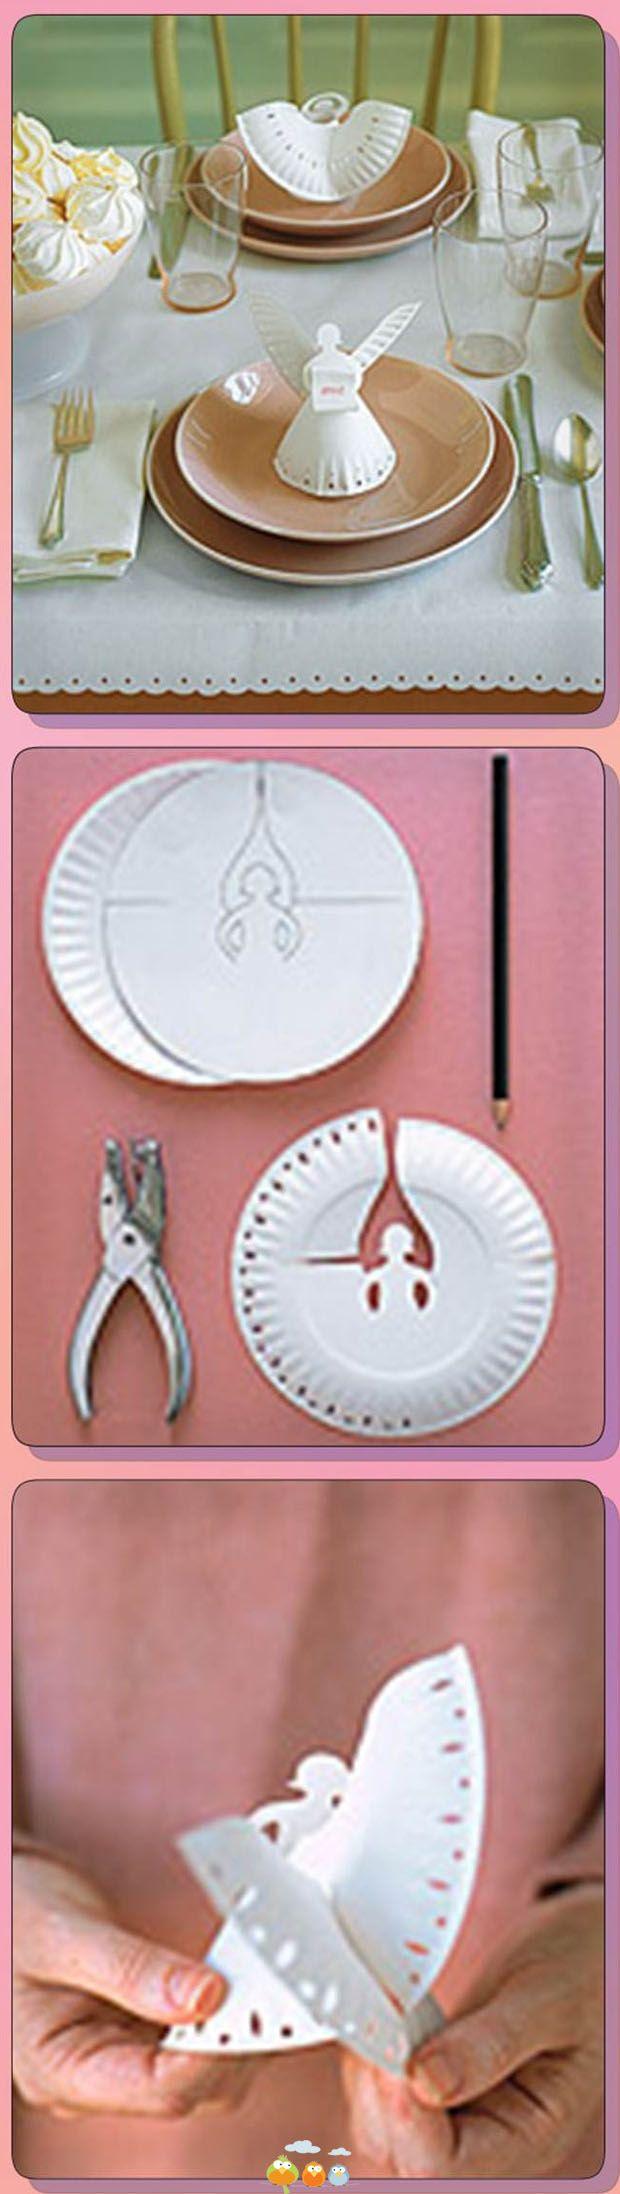 Paper-Plate Angels | COMUNION | Pinterest | Pappteller, Engelchen ...